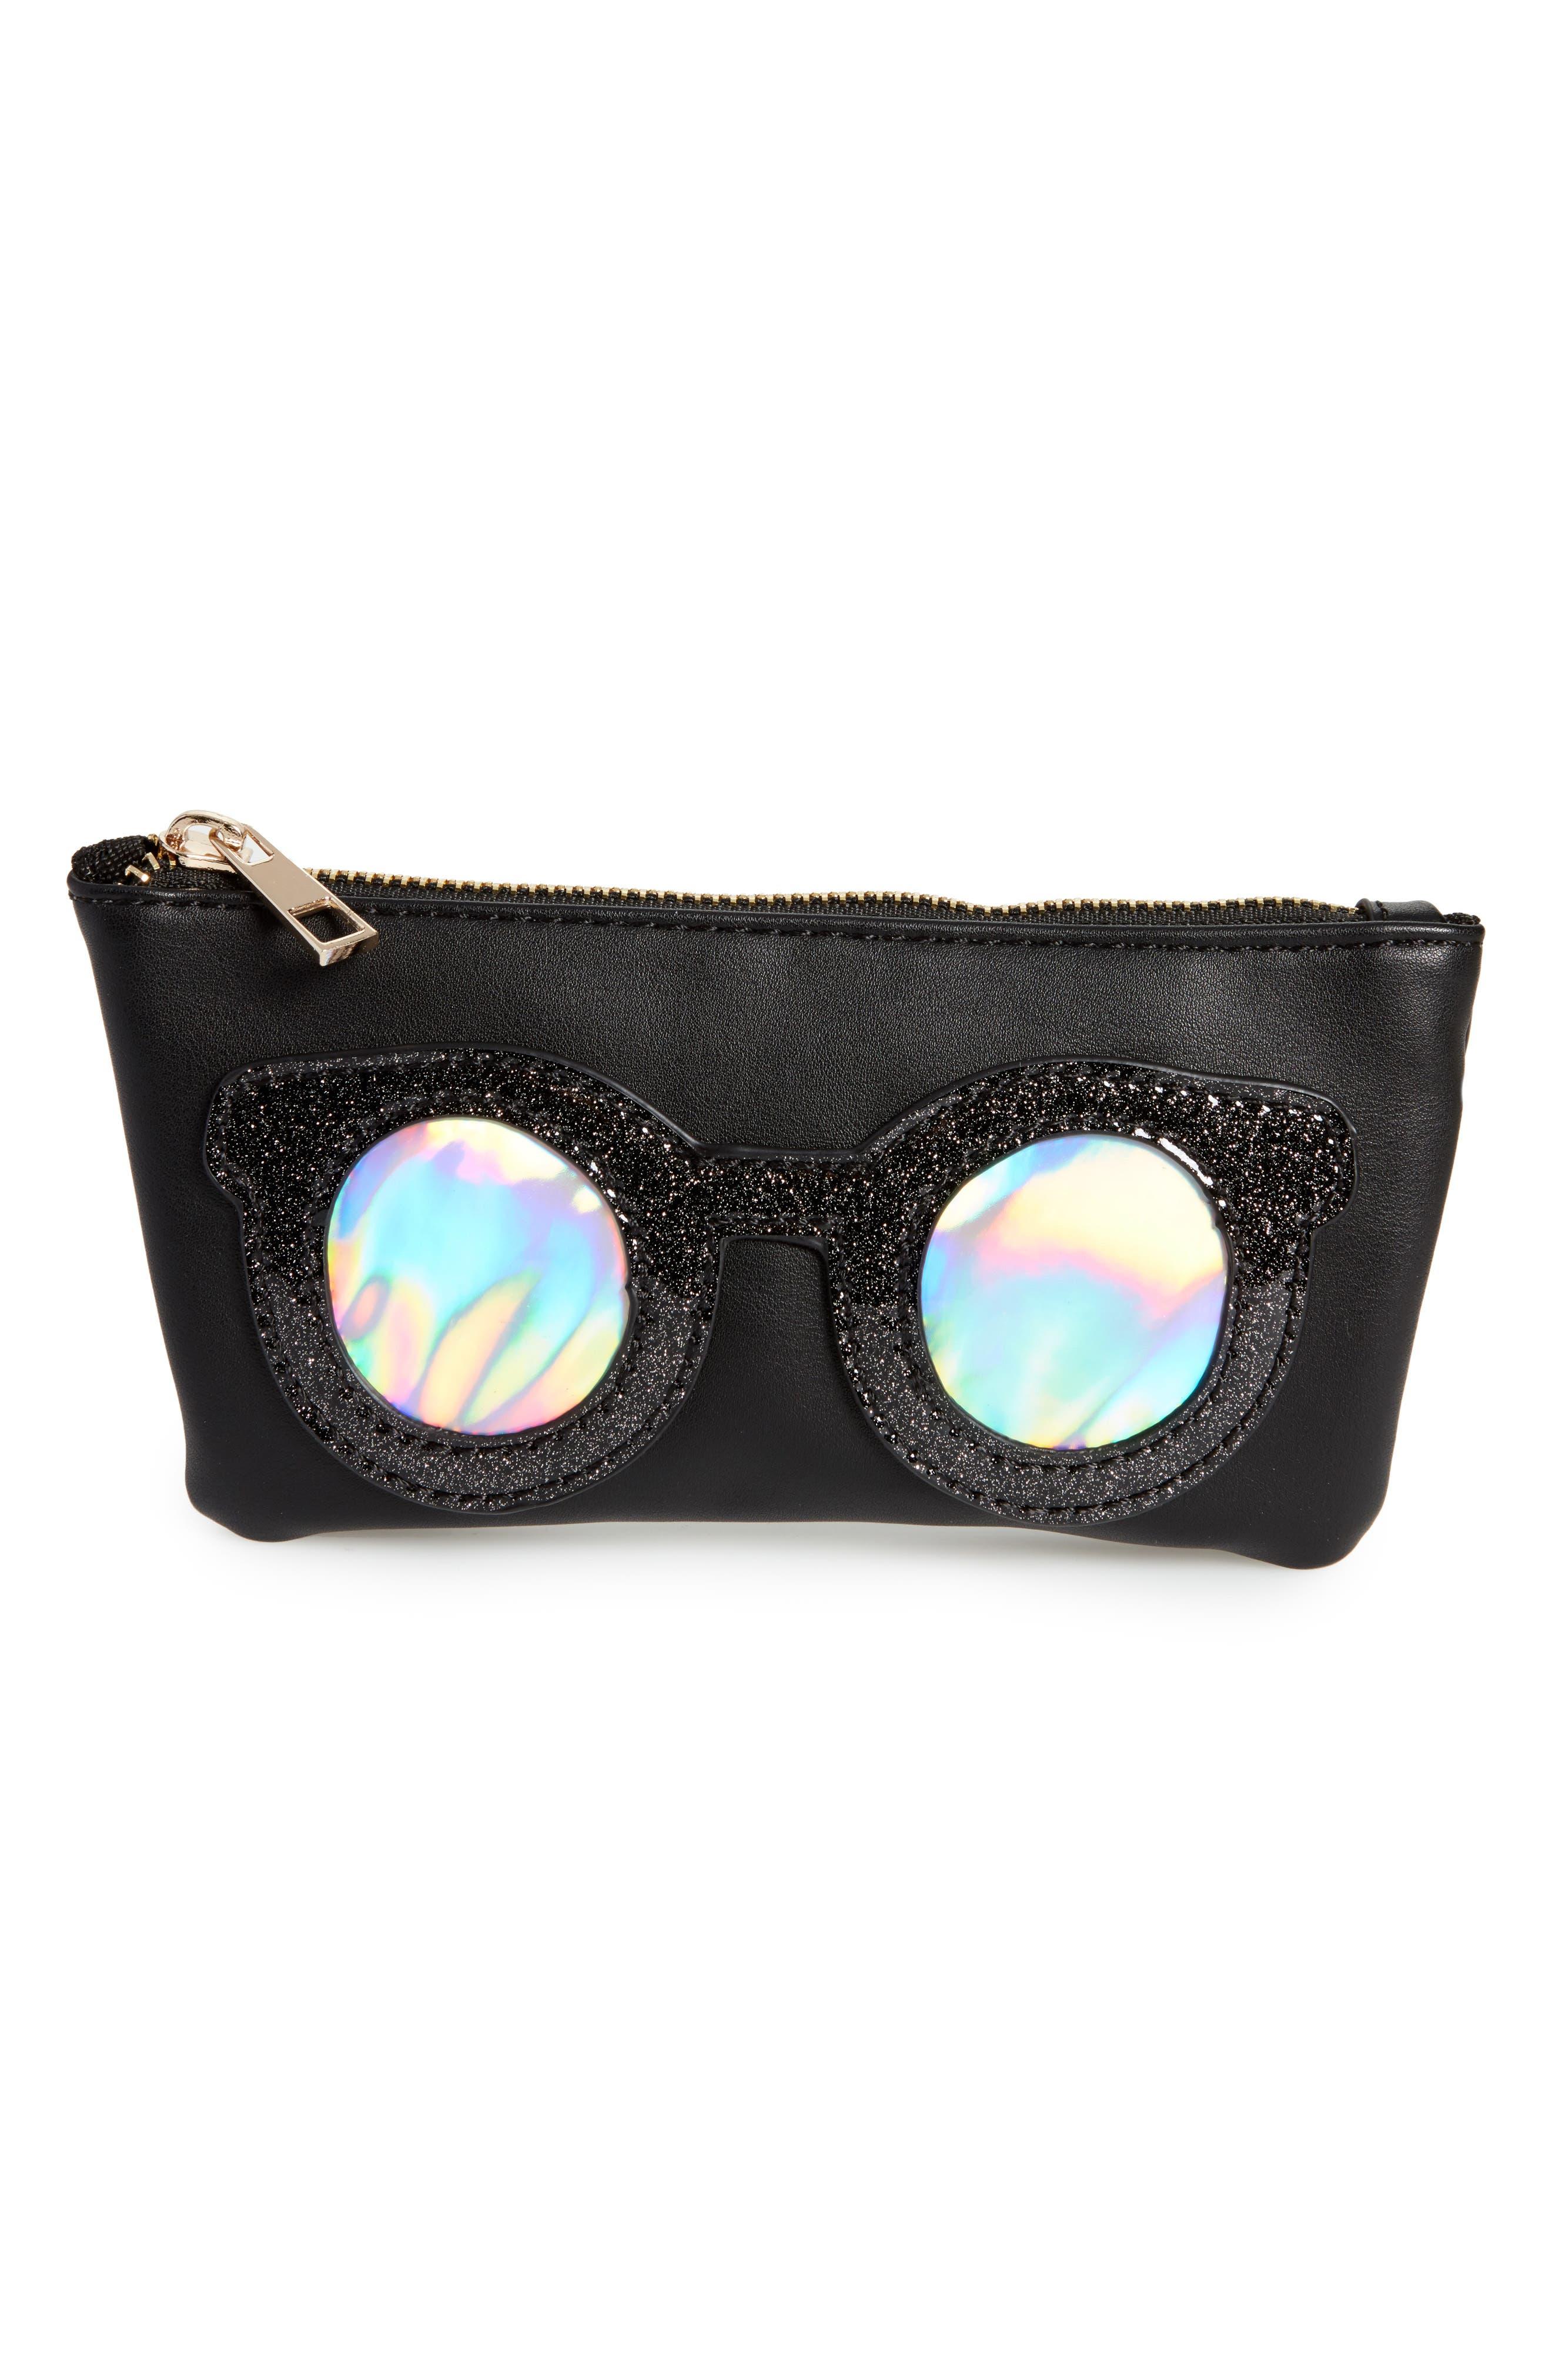 Alternate Image 1 Selected - OMG Metallic Sunnies Sunglasses Case